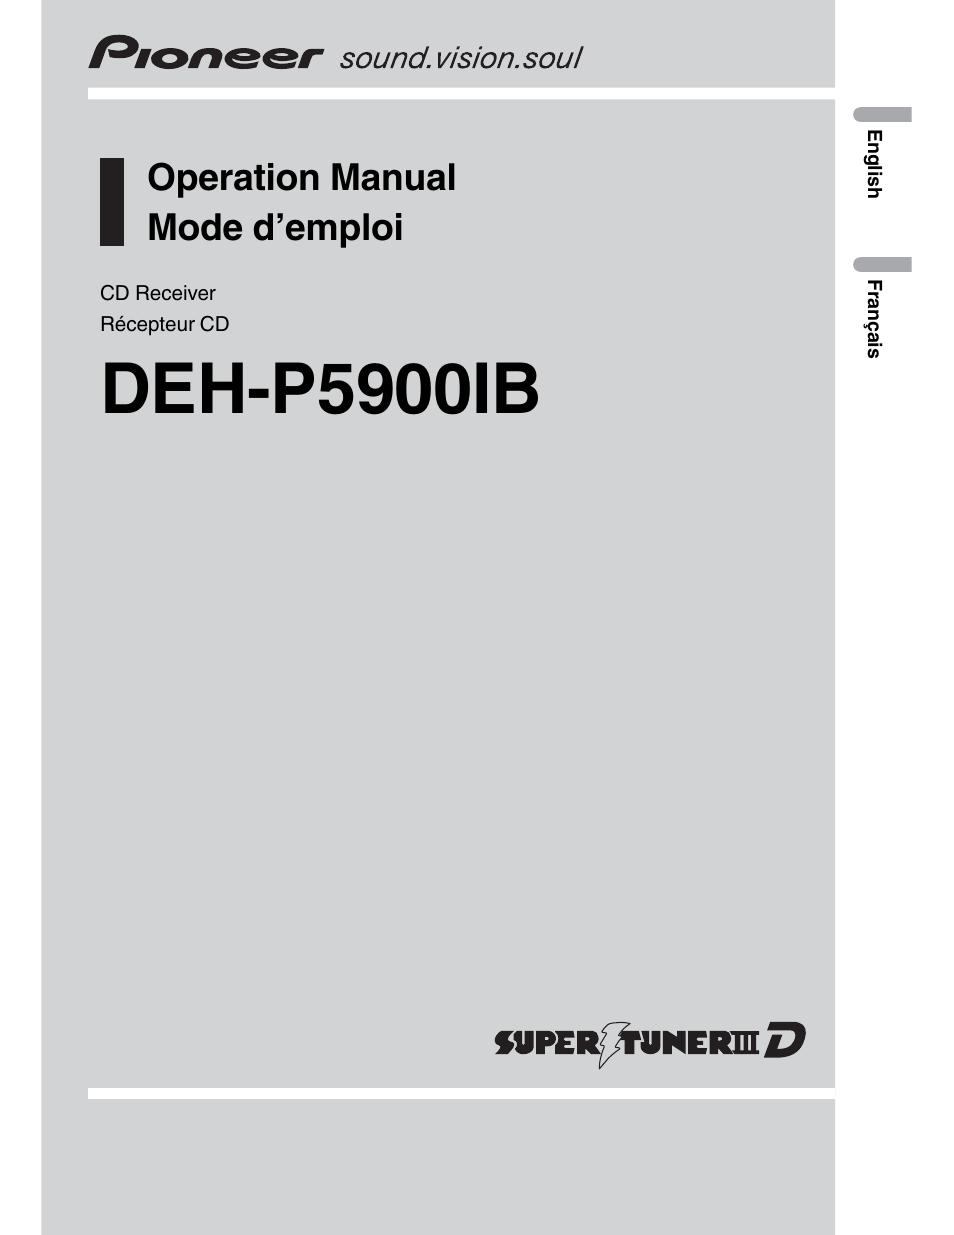 medium resolution of wiring diagram pioneer deh p5900ib